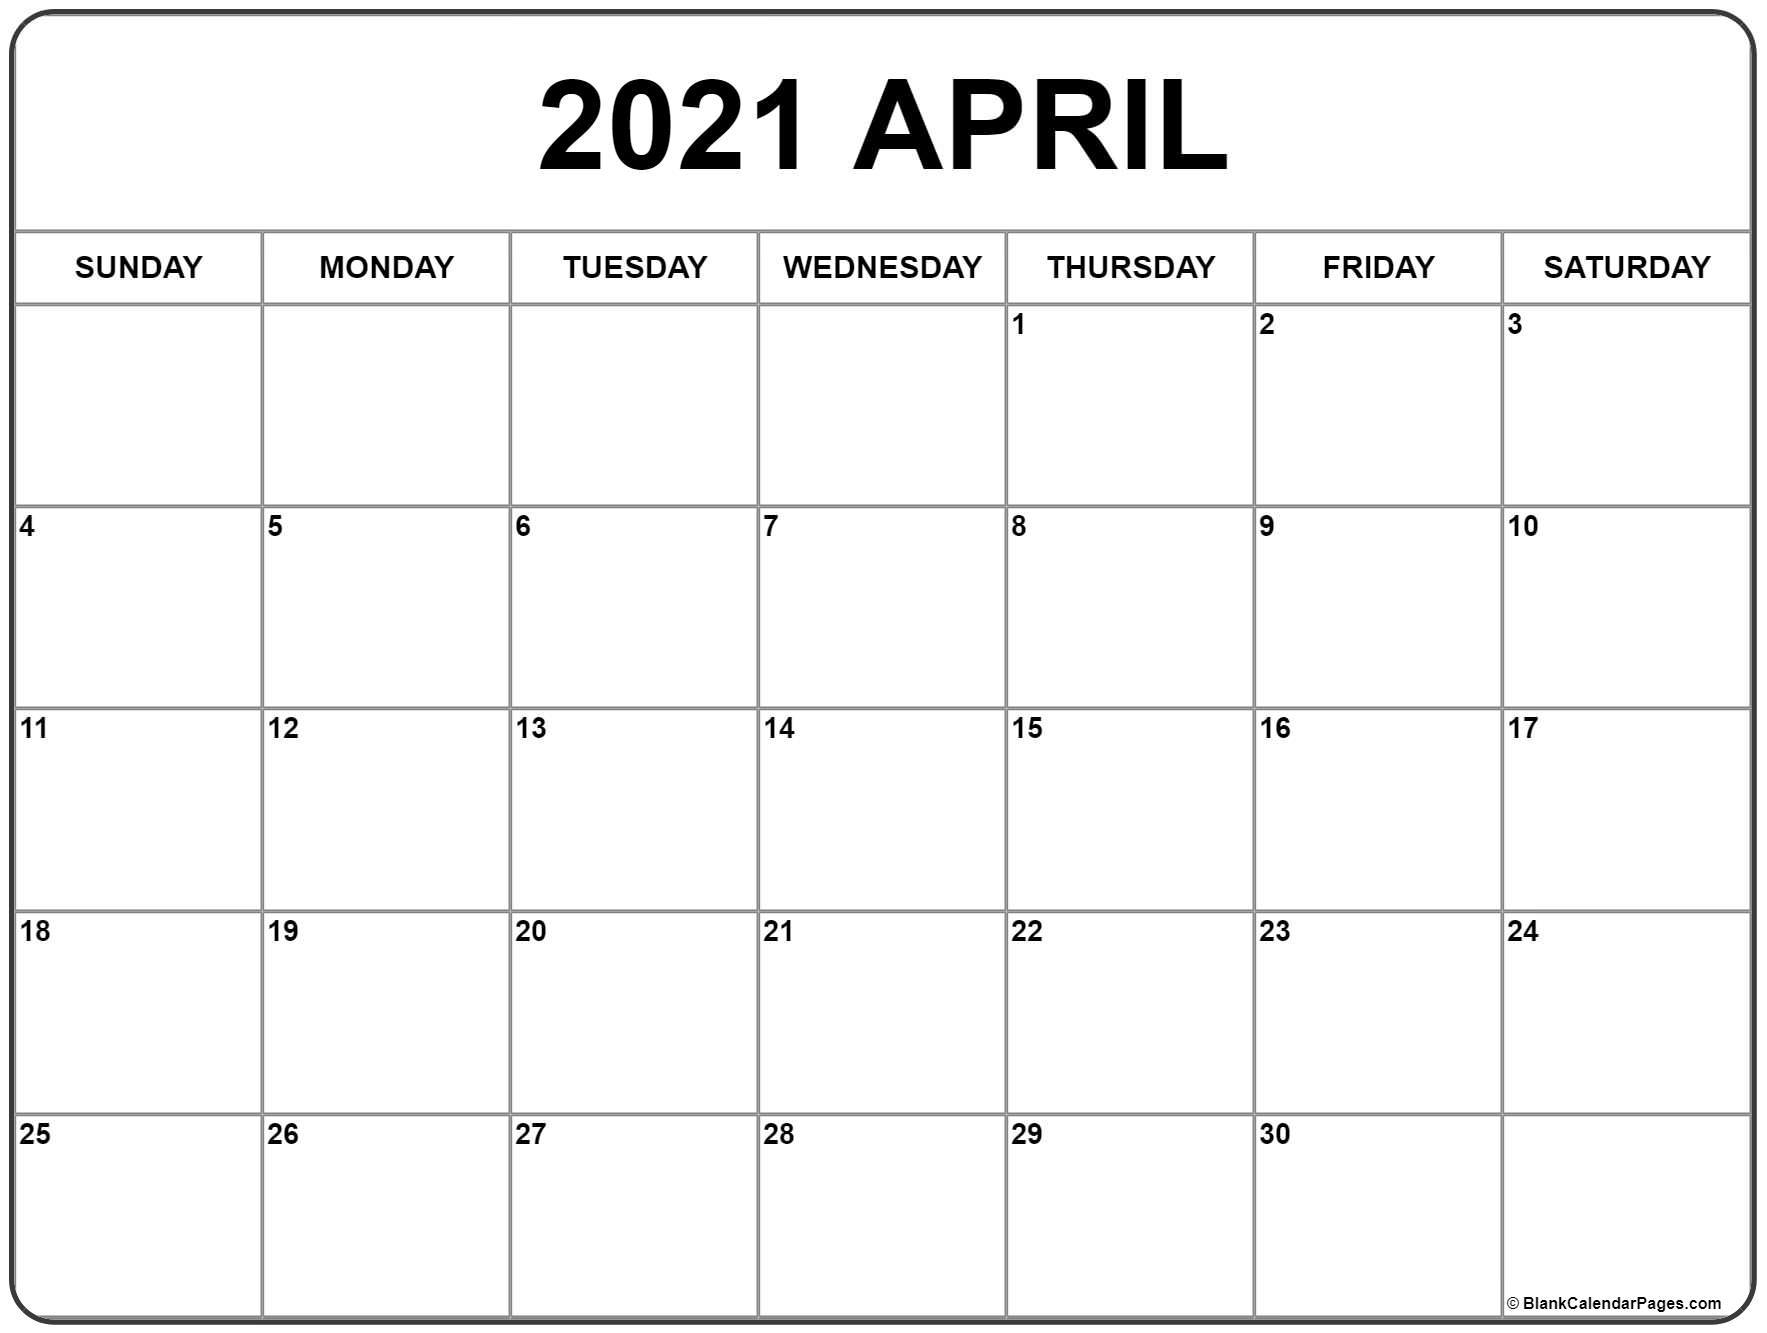 April 2021 Calendar   Free Printable Monthly Calendars regarding Printable Blank Fill In Monthly Calendar 2021